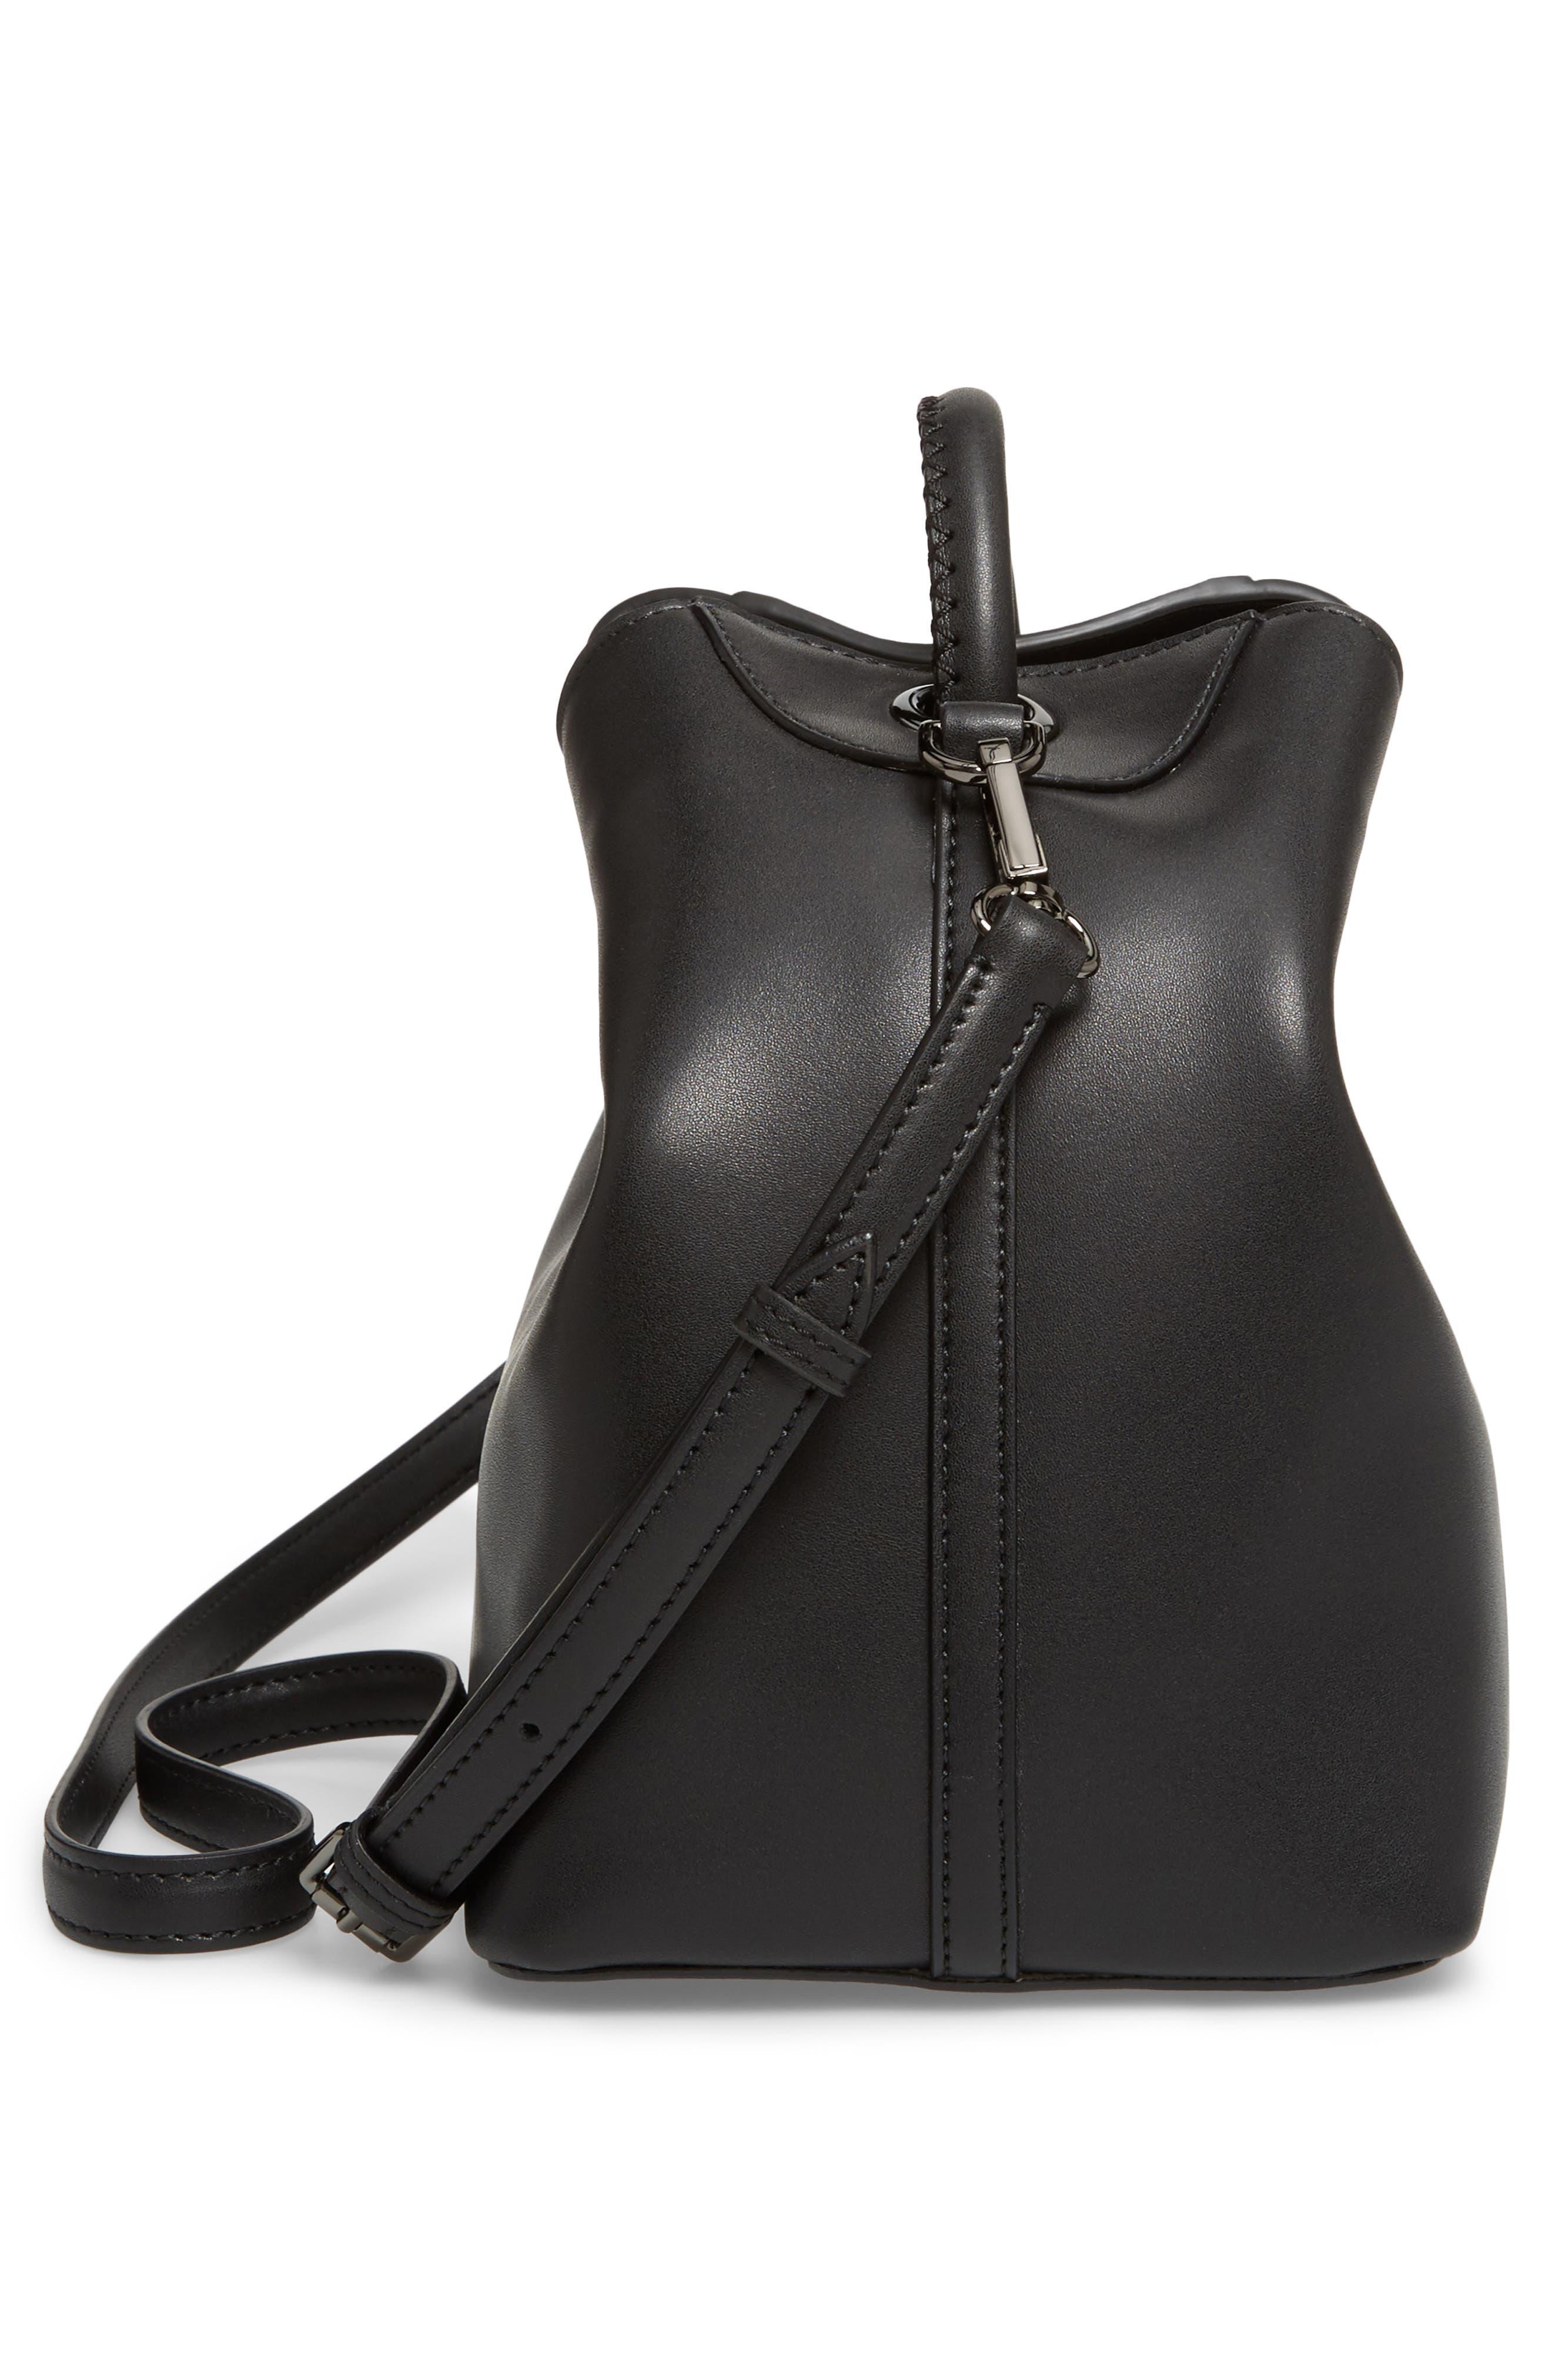 Raisin Leather Handbag,                             Alternate thumbnail 5, color,                             001